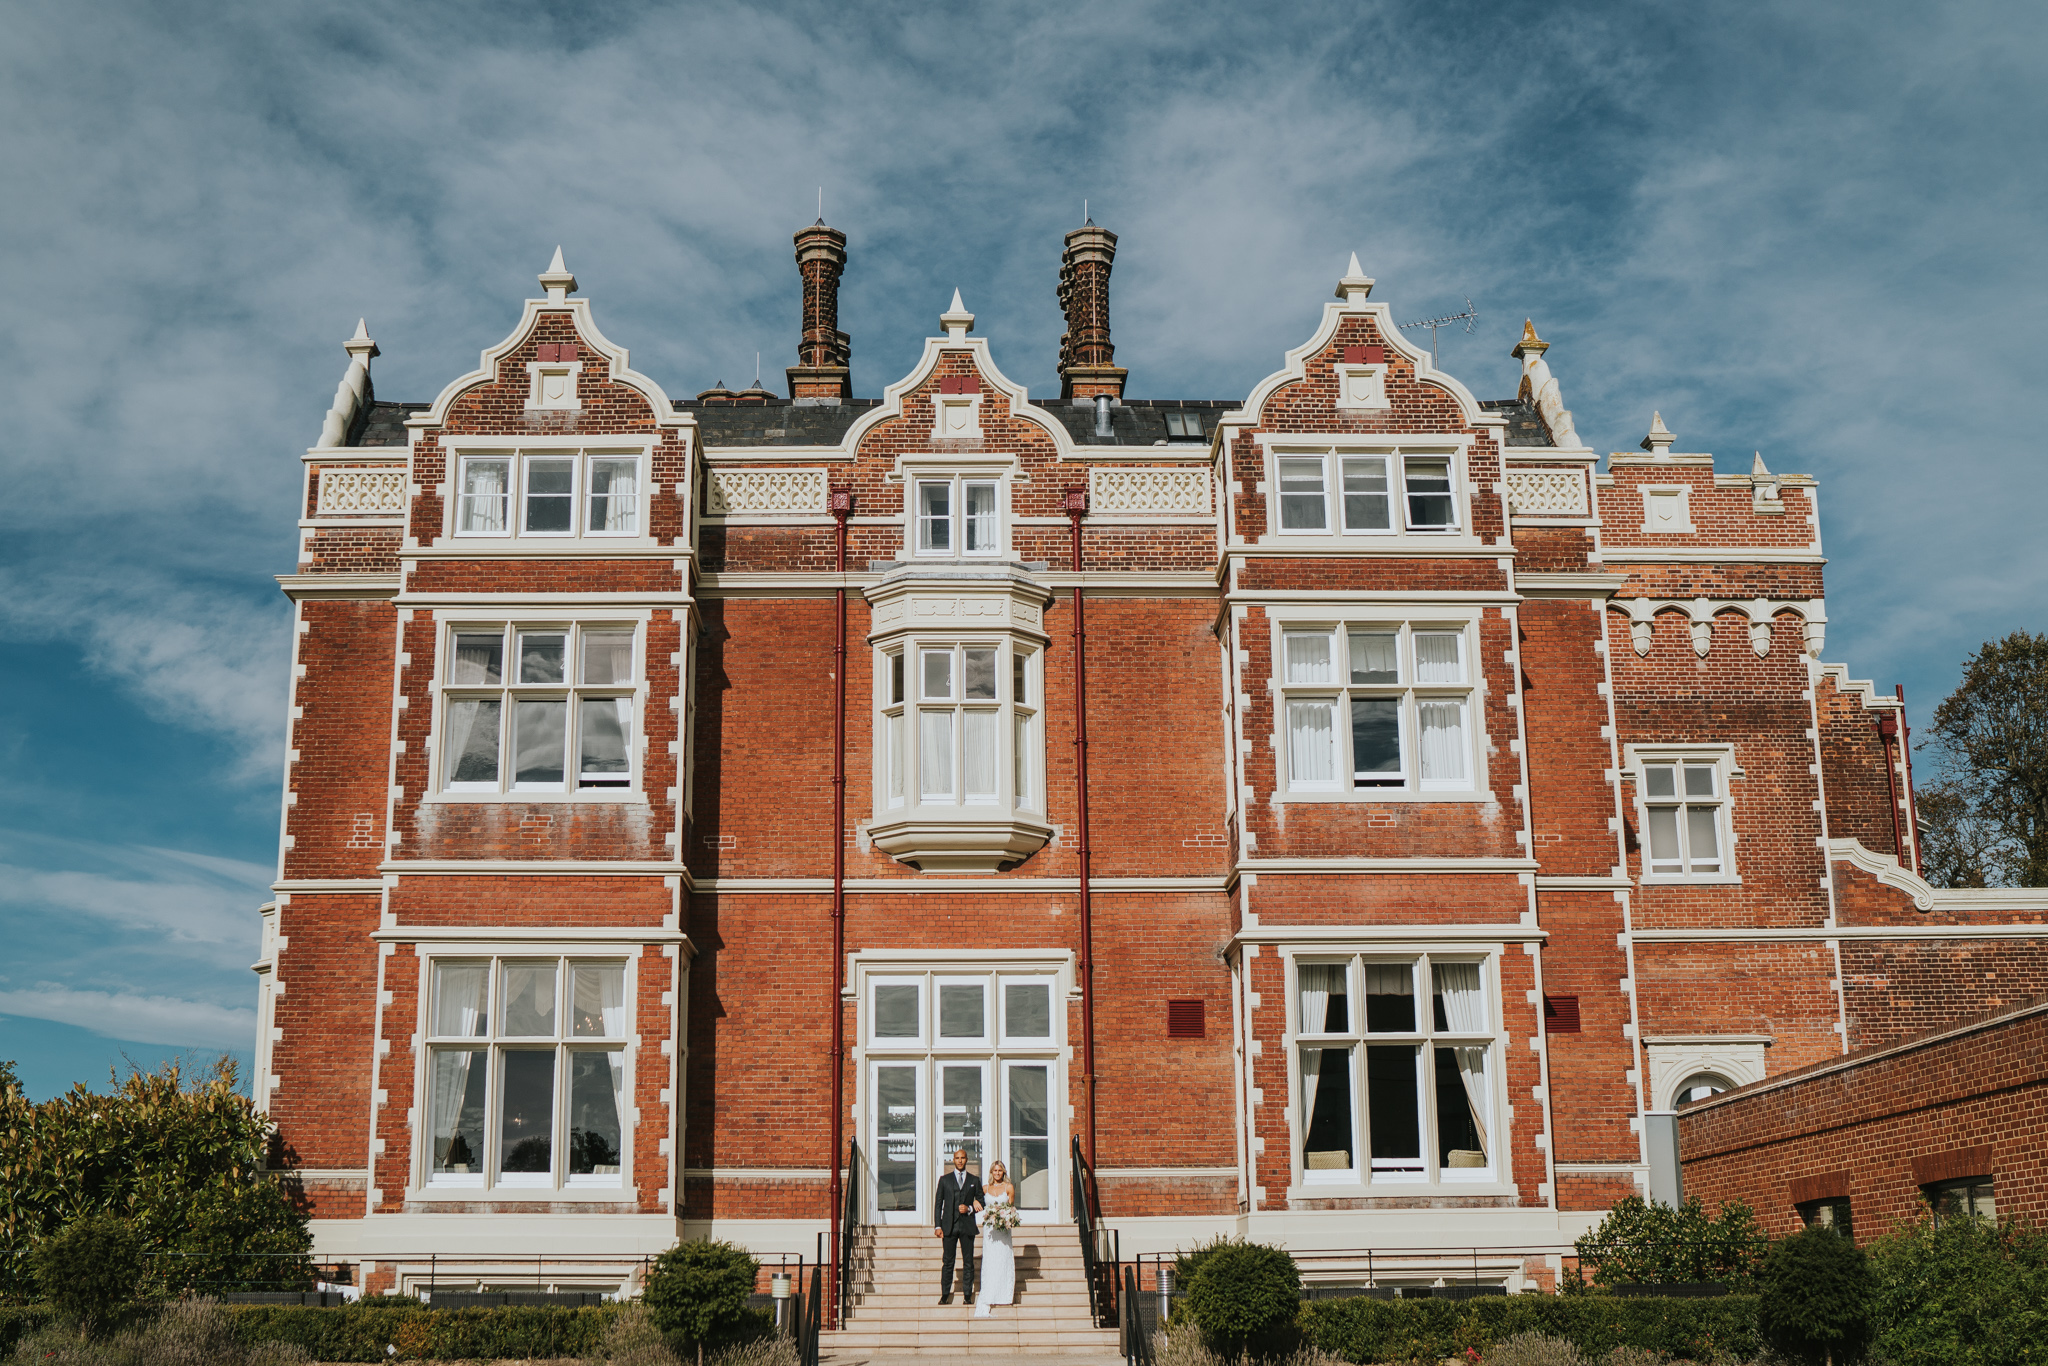 Sarah-Alex-Wivenhoe-House-St-Osyth-Church-Intimate-Wedding-Grace-Elizabeth-Colchester-Essex-Alternative-Wedding-Lifestyle-Photographer (7 of 11).jpg